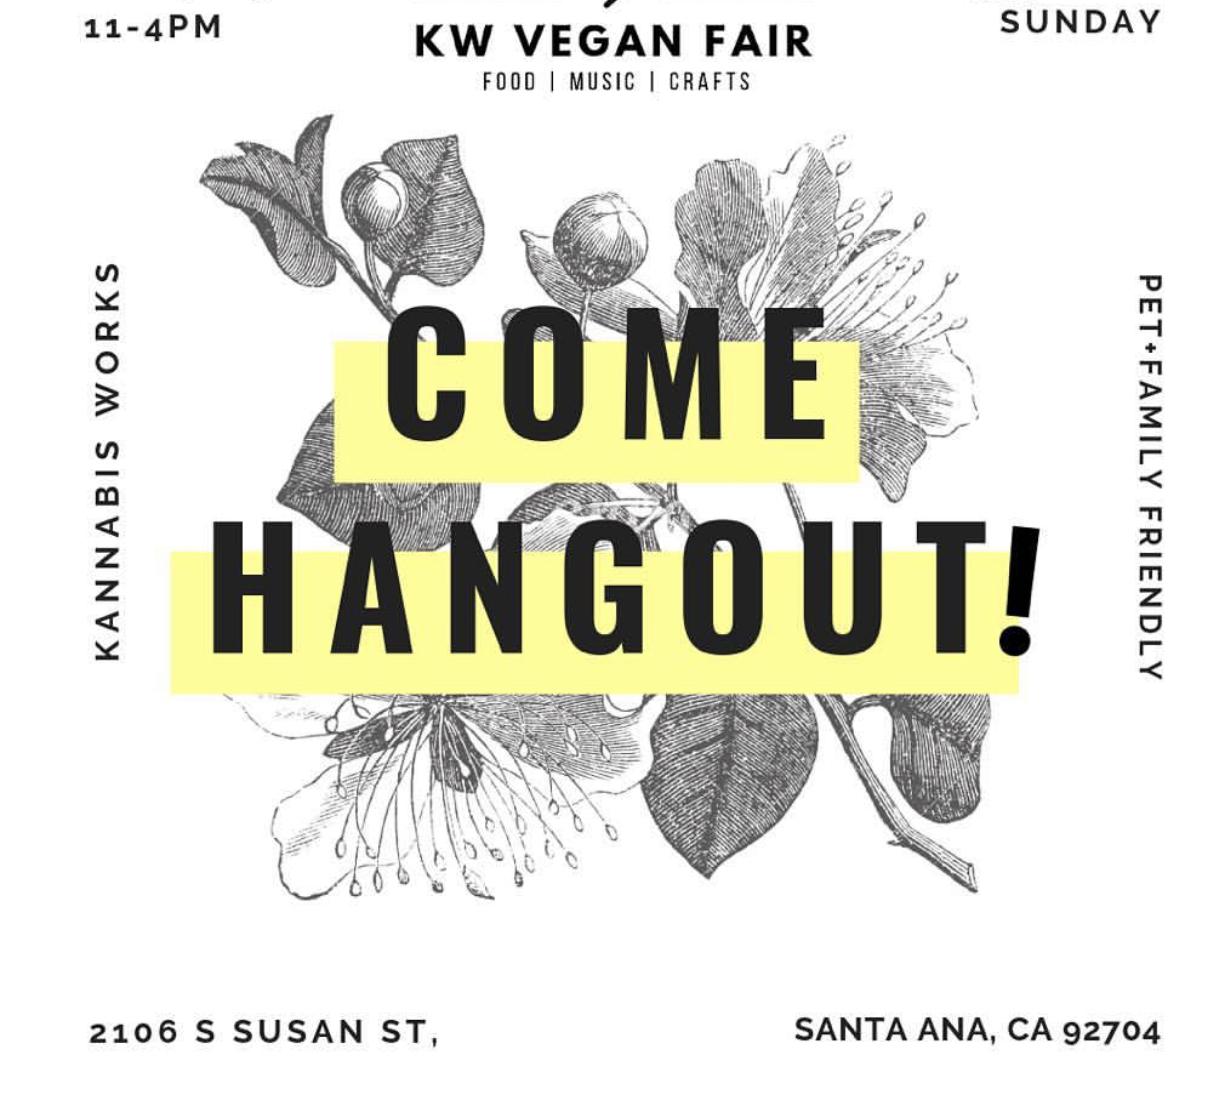 KW Vegan Fair